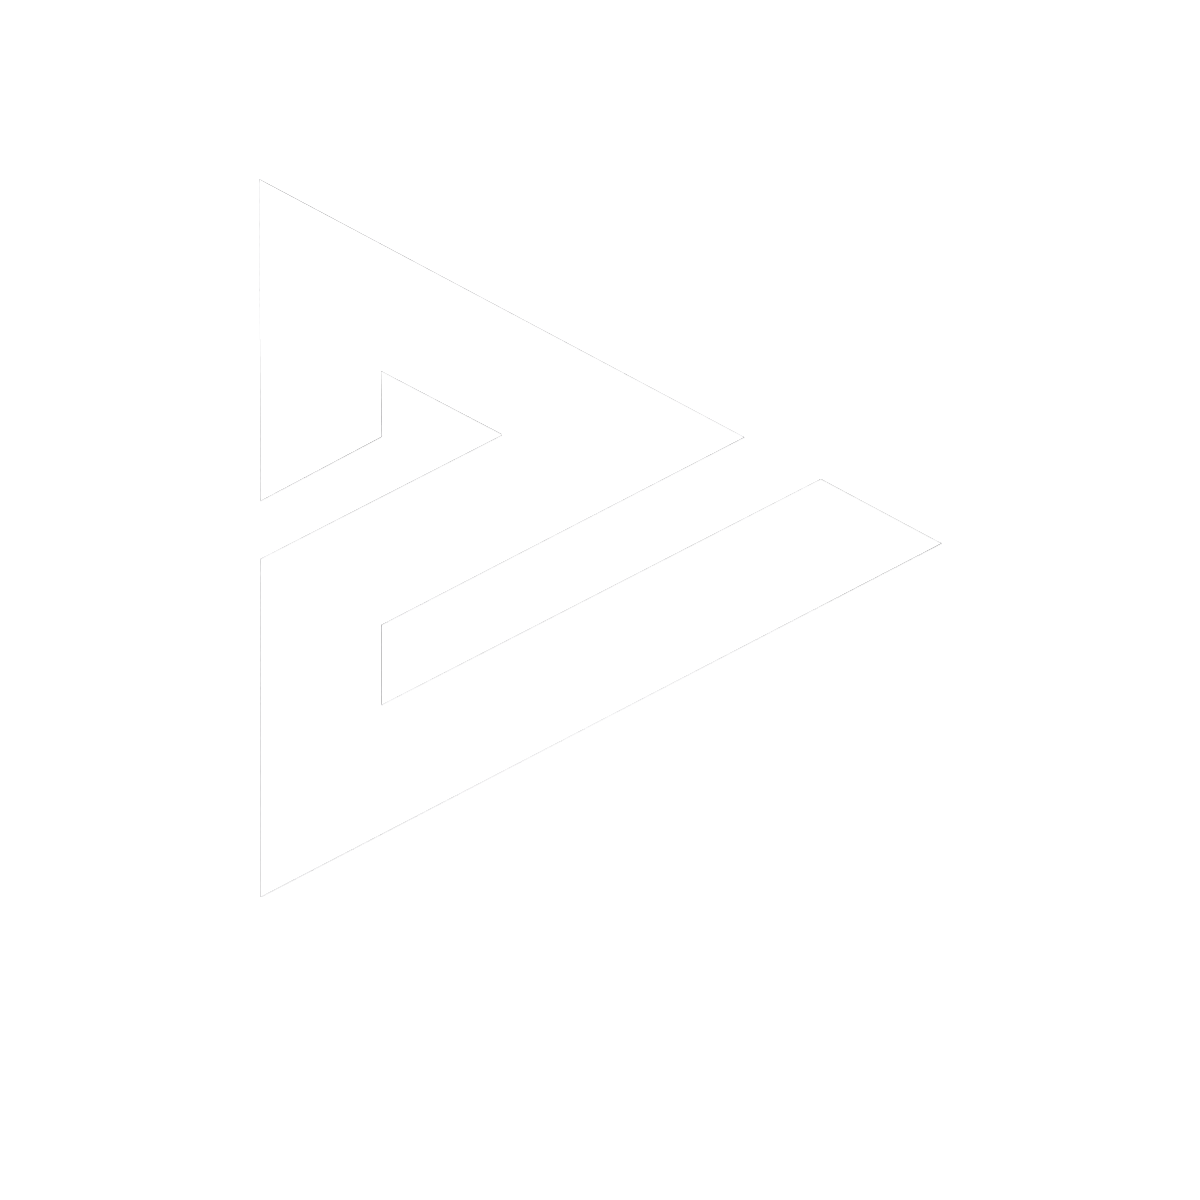 KPOP DANCE | Start From Here